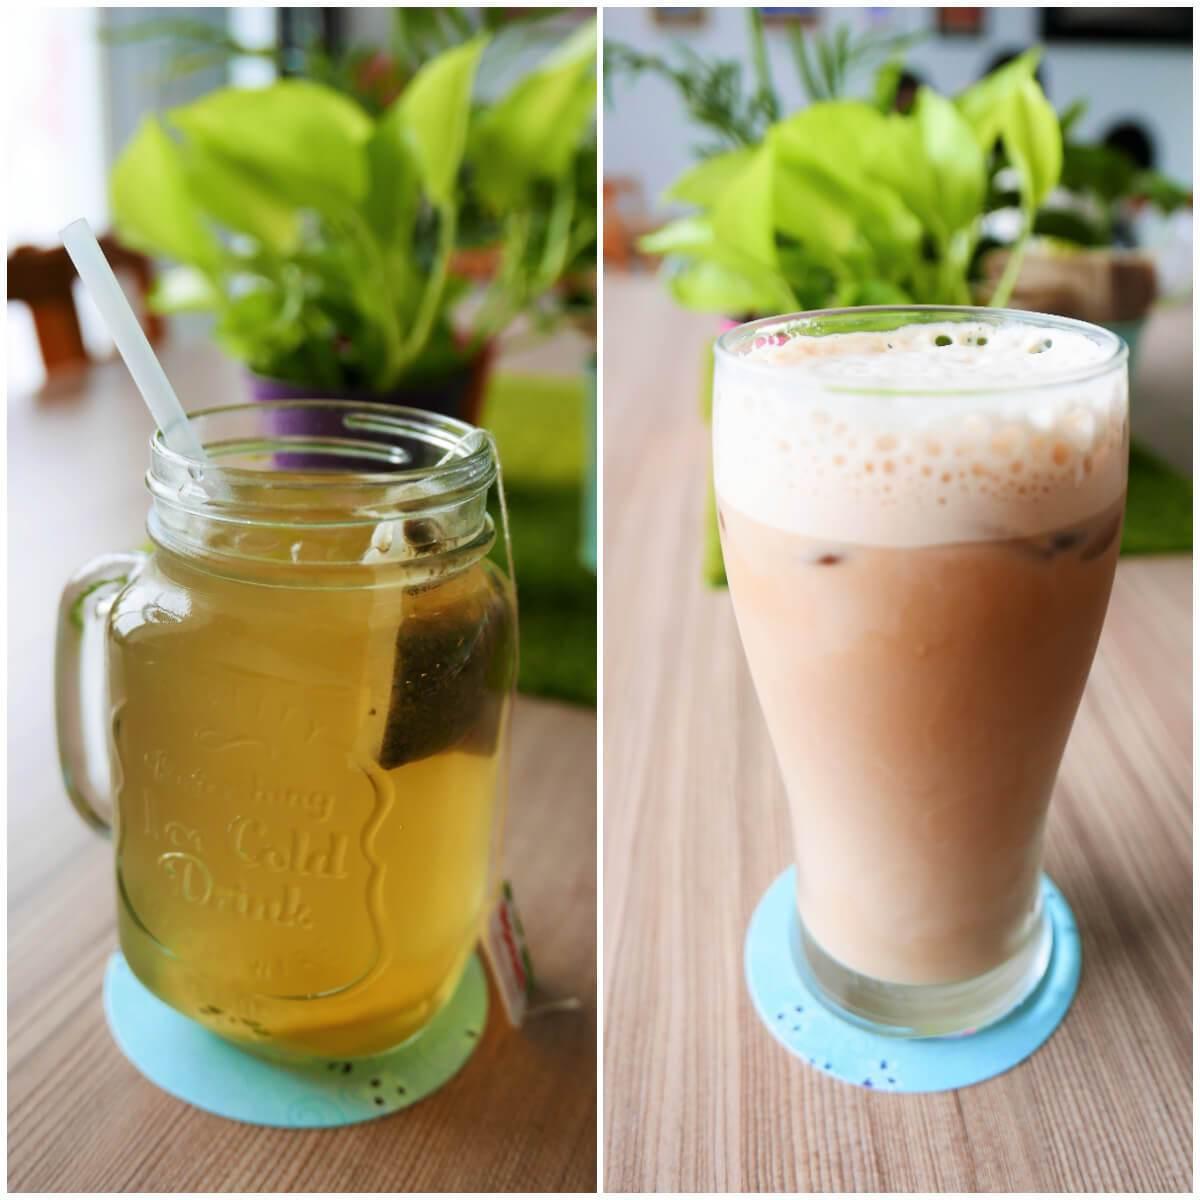 圖/Lemon、芷瑄(阿根廷瑪黛茶NT$65/鴛鴦鮮奶茶NT$70)